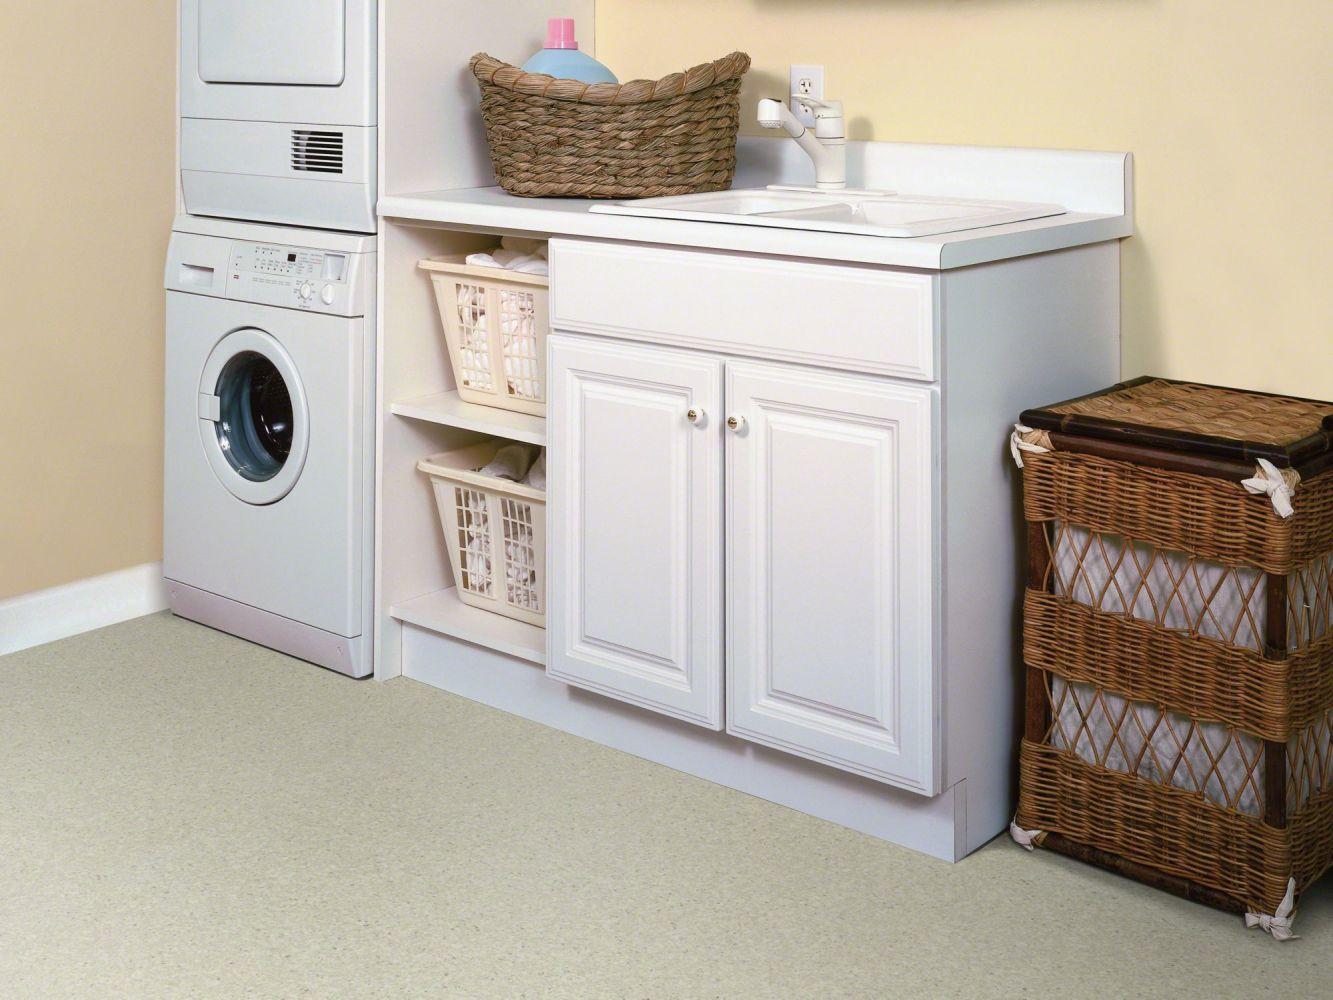 Shaw Floors Resilient Residential Reflectance 00152_0613V